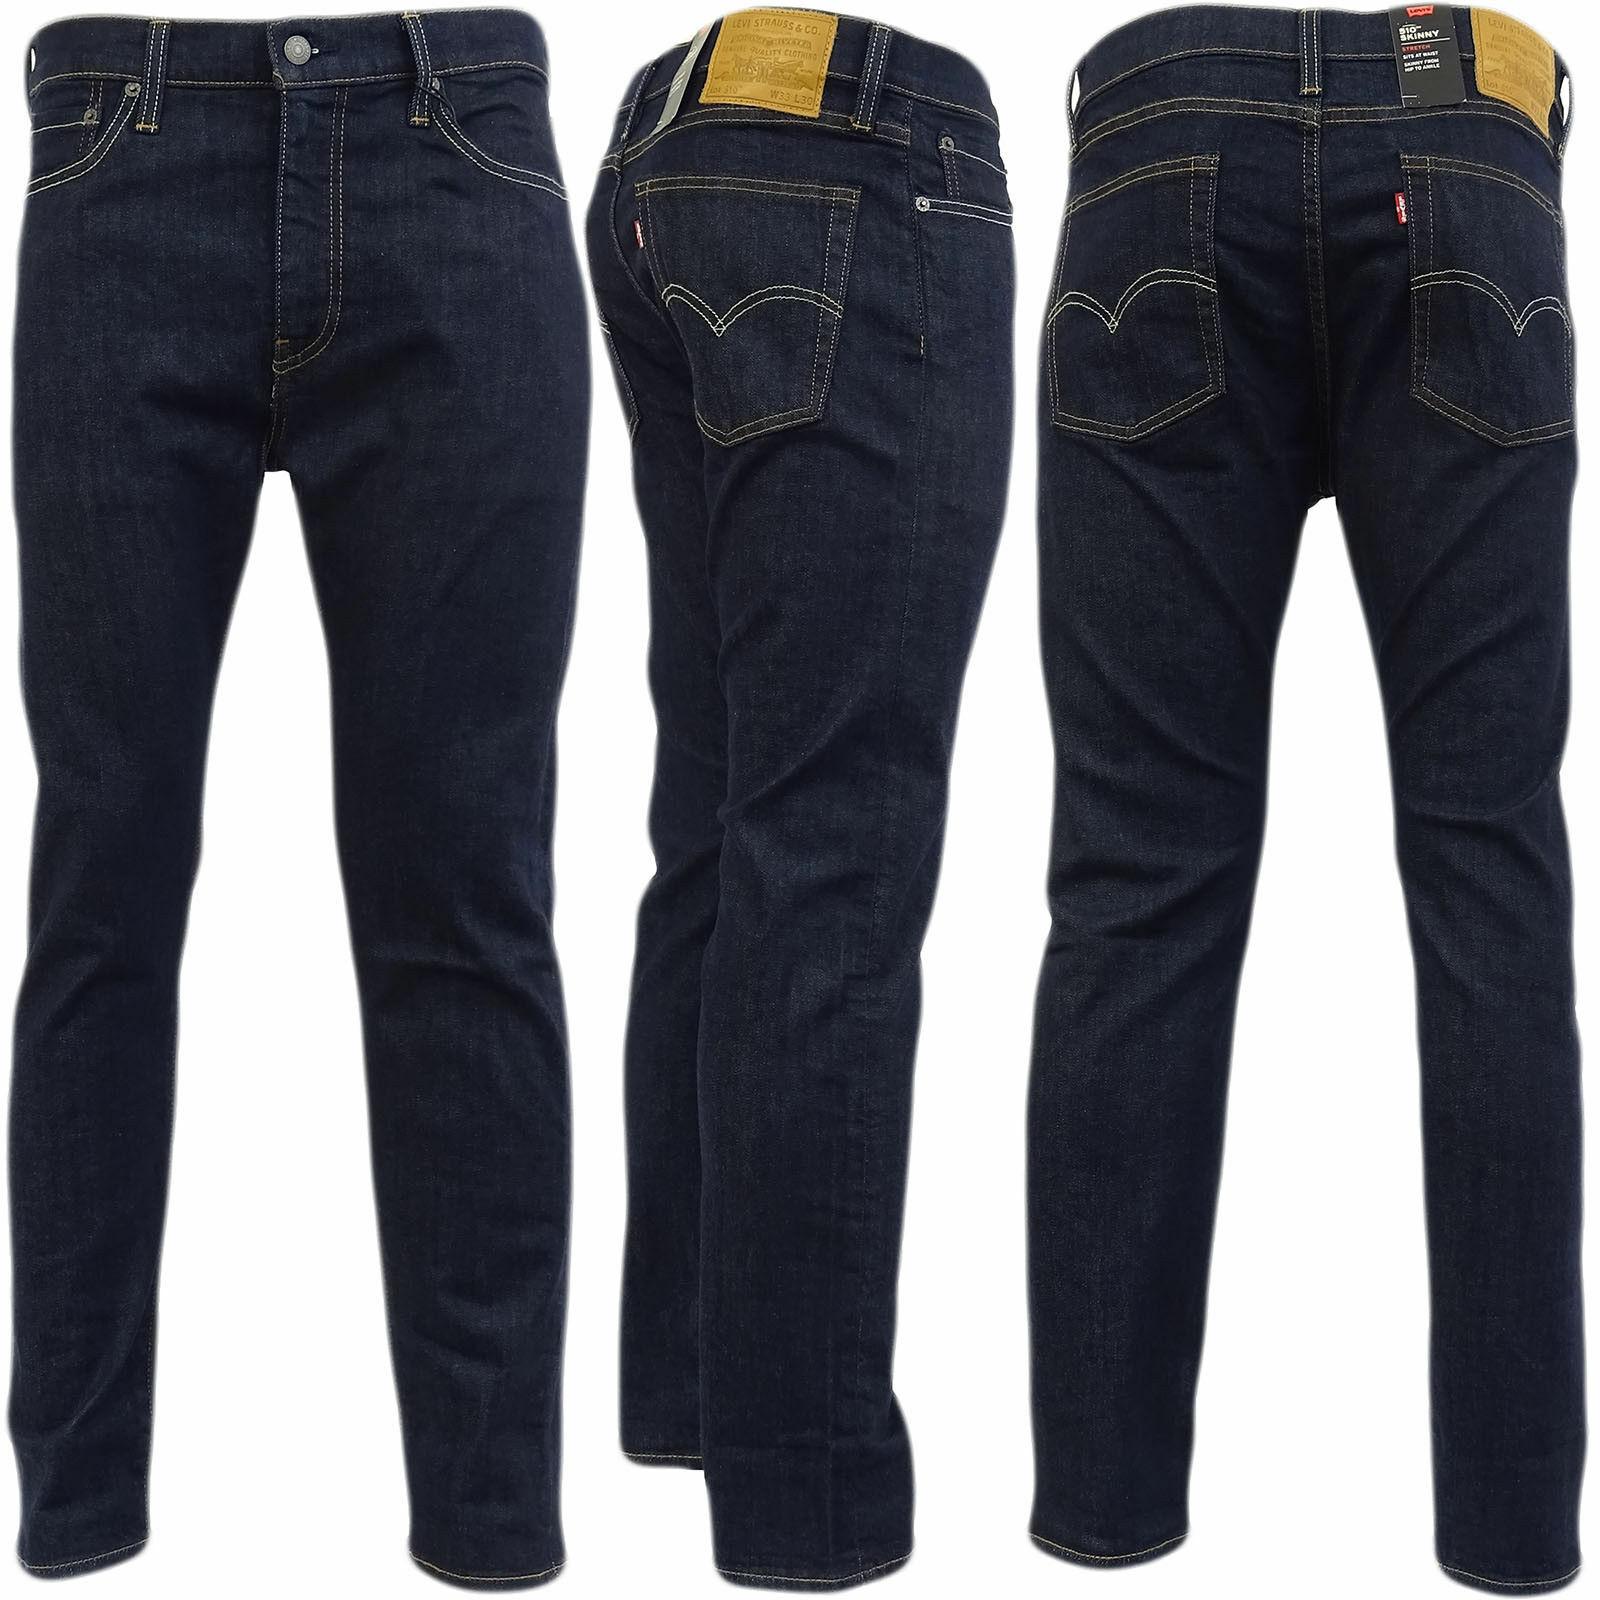 Levi's 510 Advanced Stretch Skinny Fit Mens Jeans Cleaner ADV STR Dark Blue New